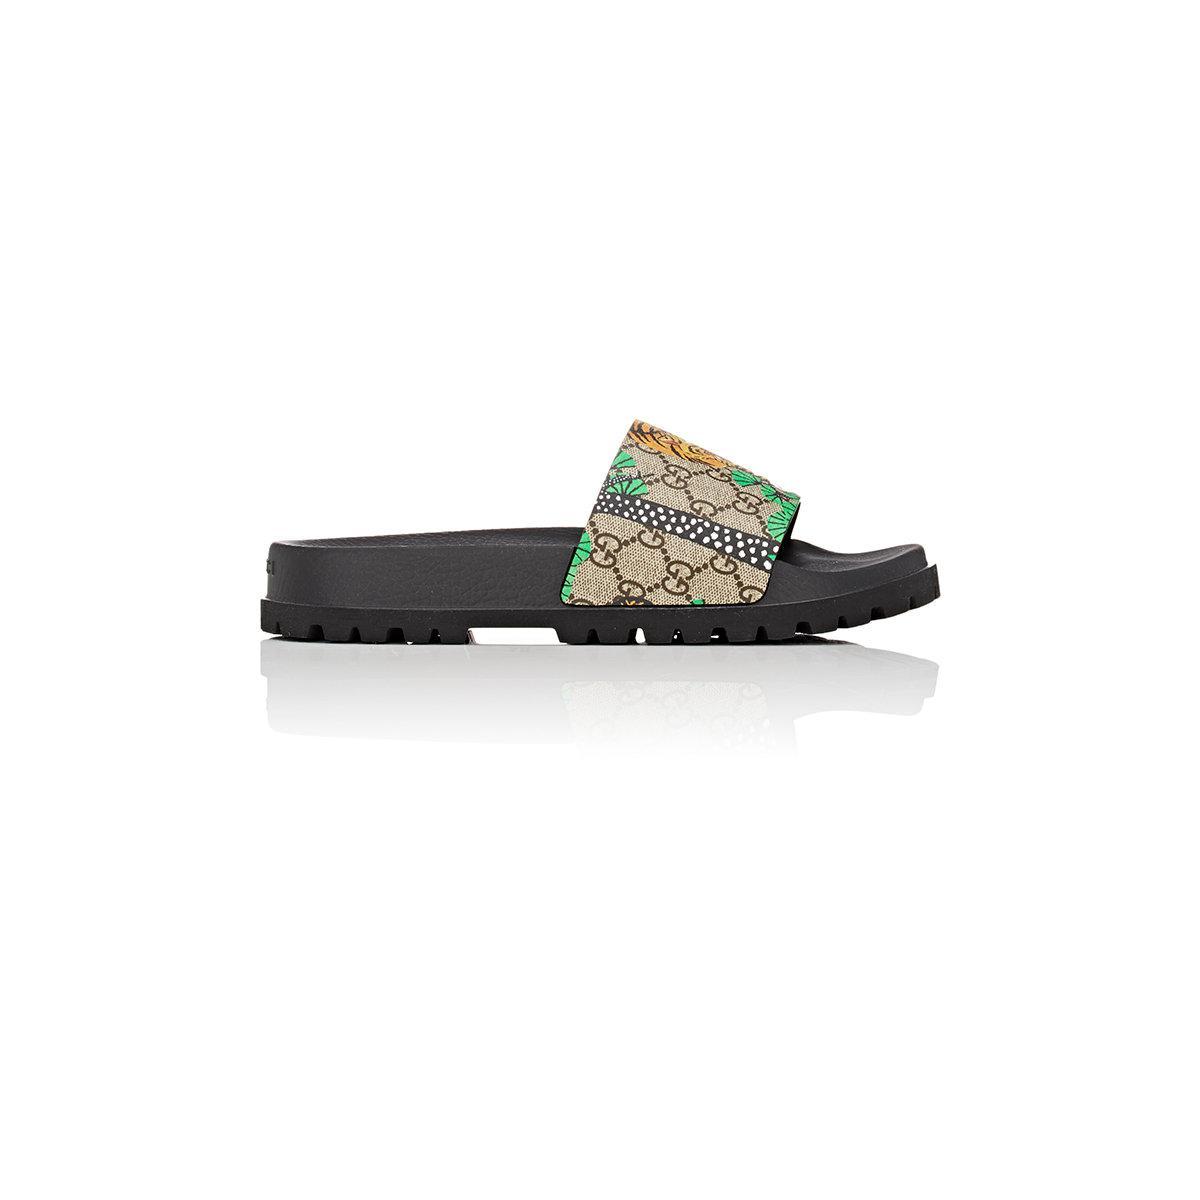 eee25da41 Lyst - Gucci Pursuit Treck Coated Canvas Slide Sandals